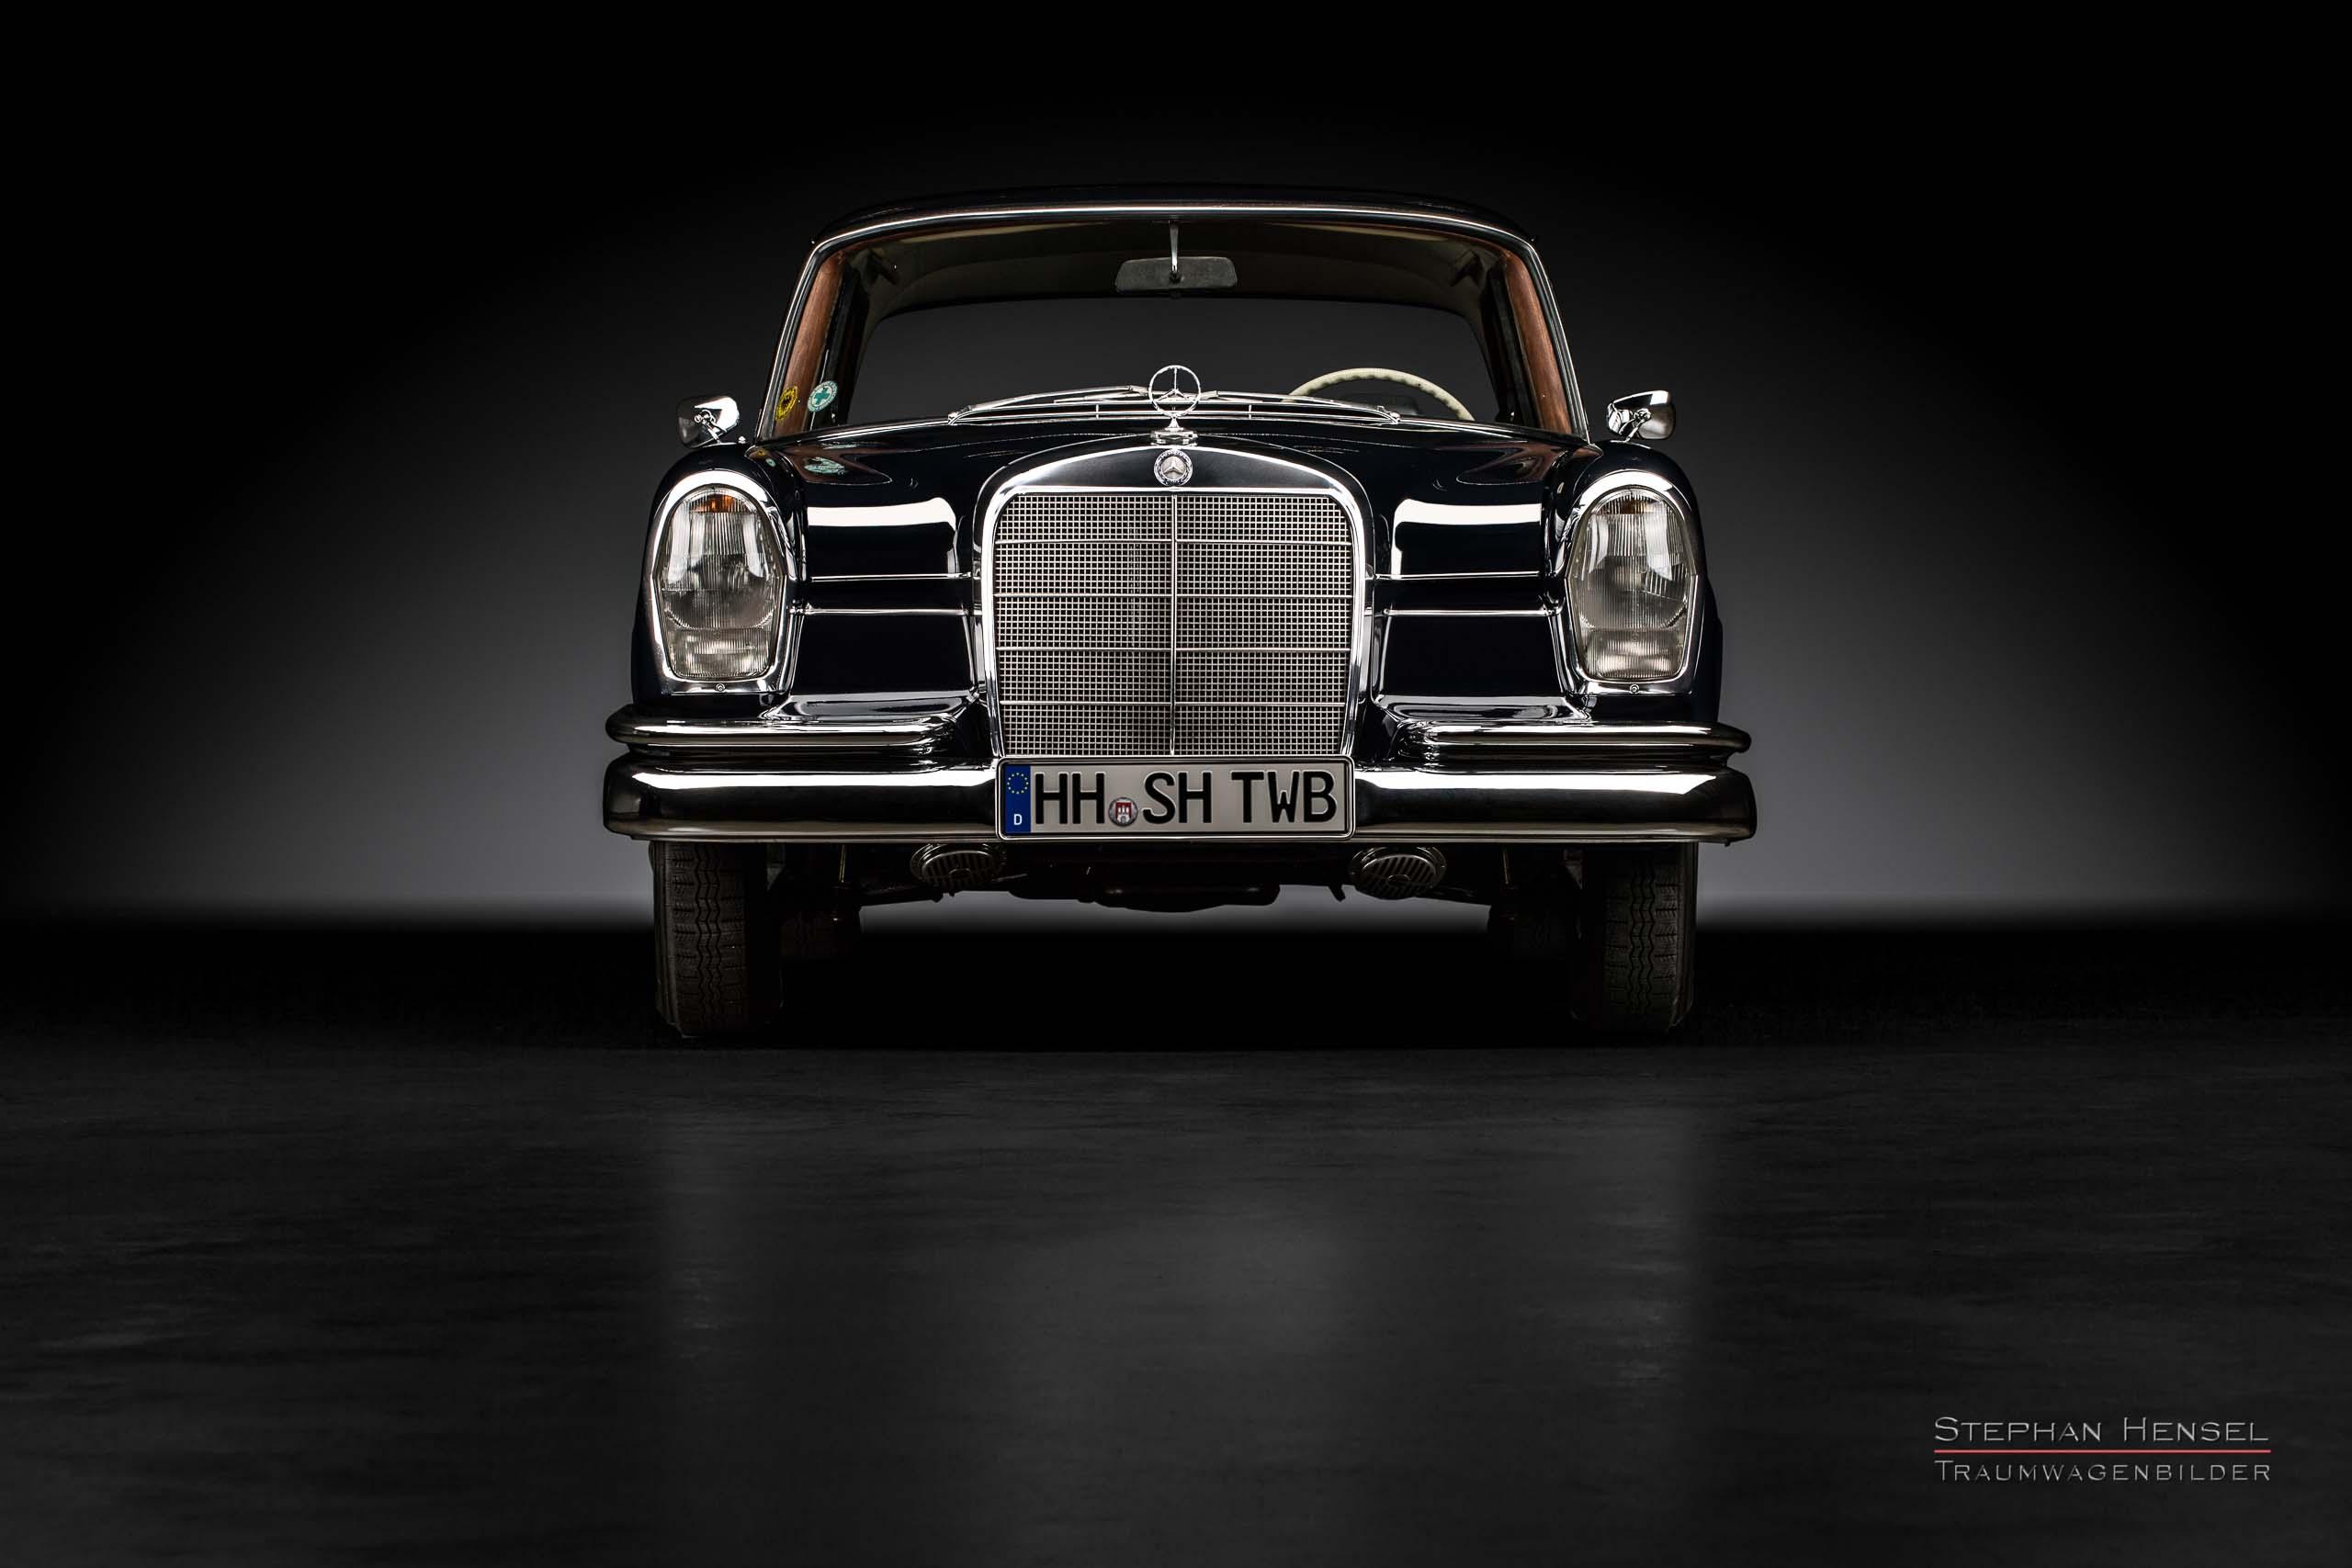 Mercedes-Benz 230 S (W111), Frontalansicht, Autofotograf: Stephan Hensel, Oldtimerfotograf, Hamburg